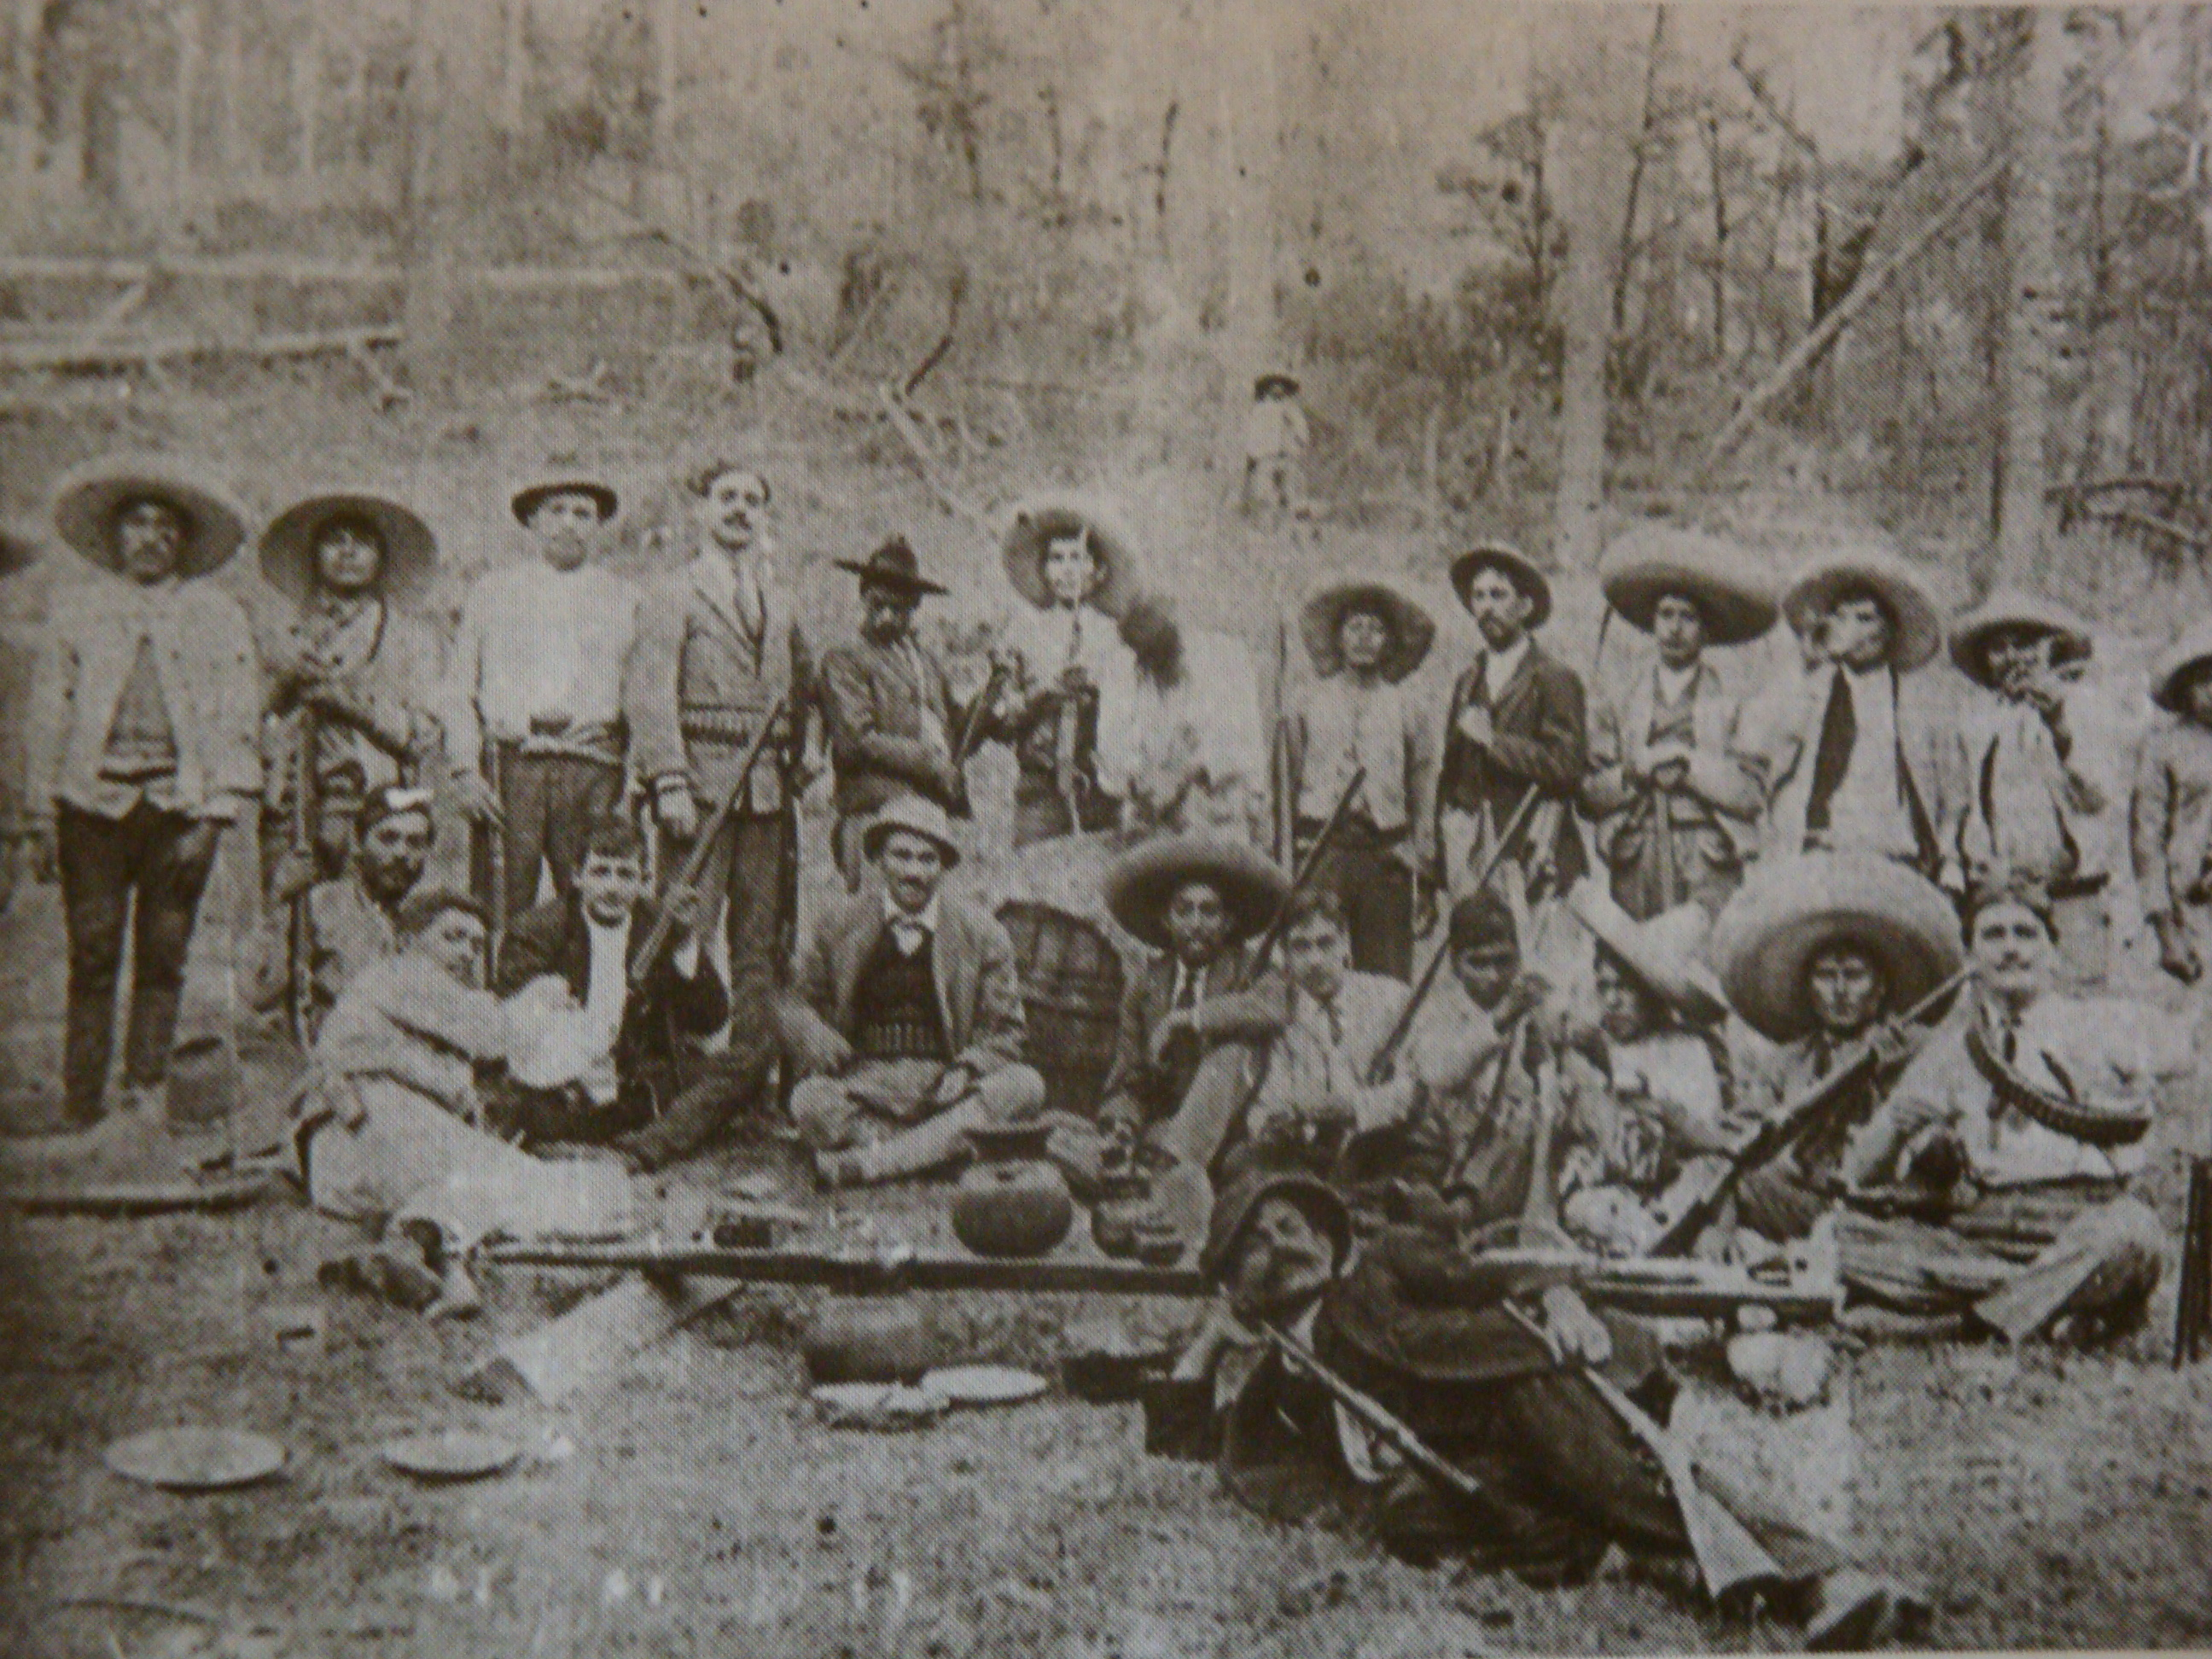 Fotos de la revolucion mexicana de 1910 75